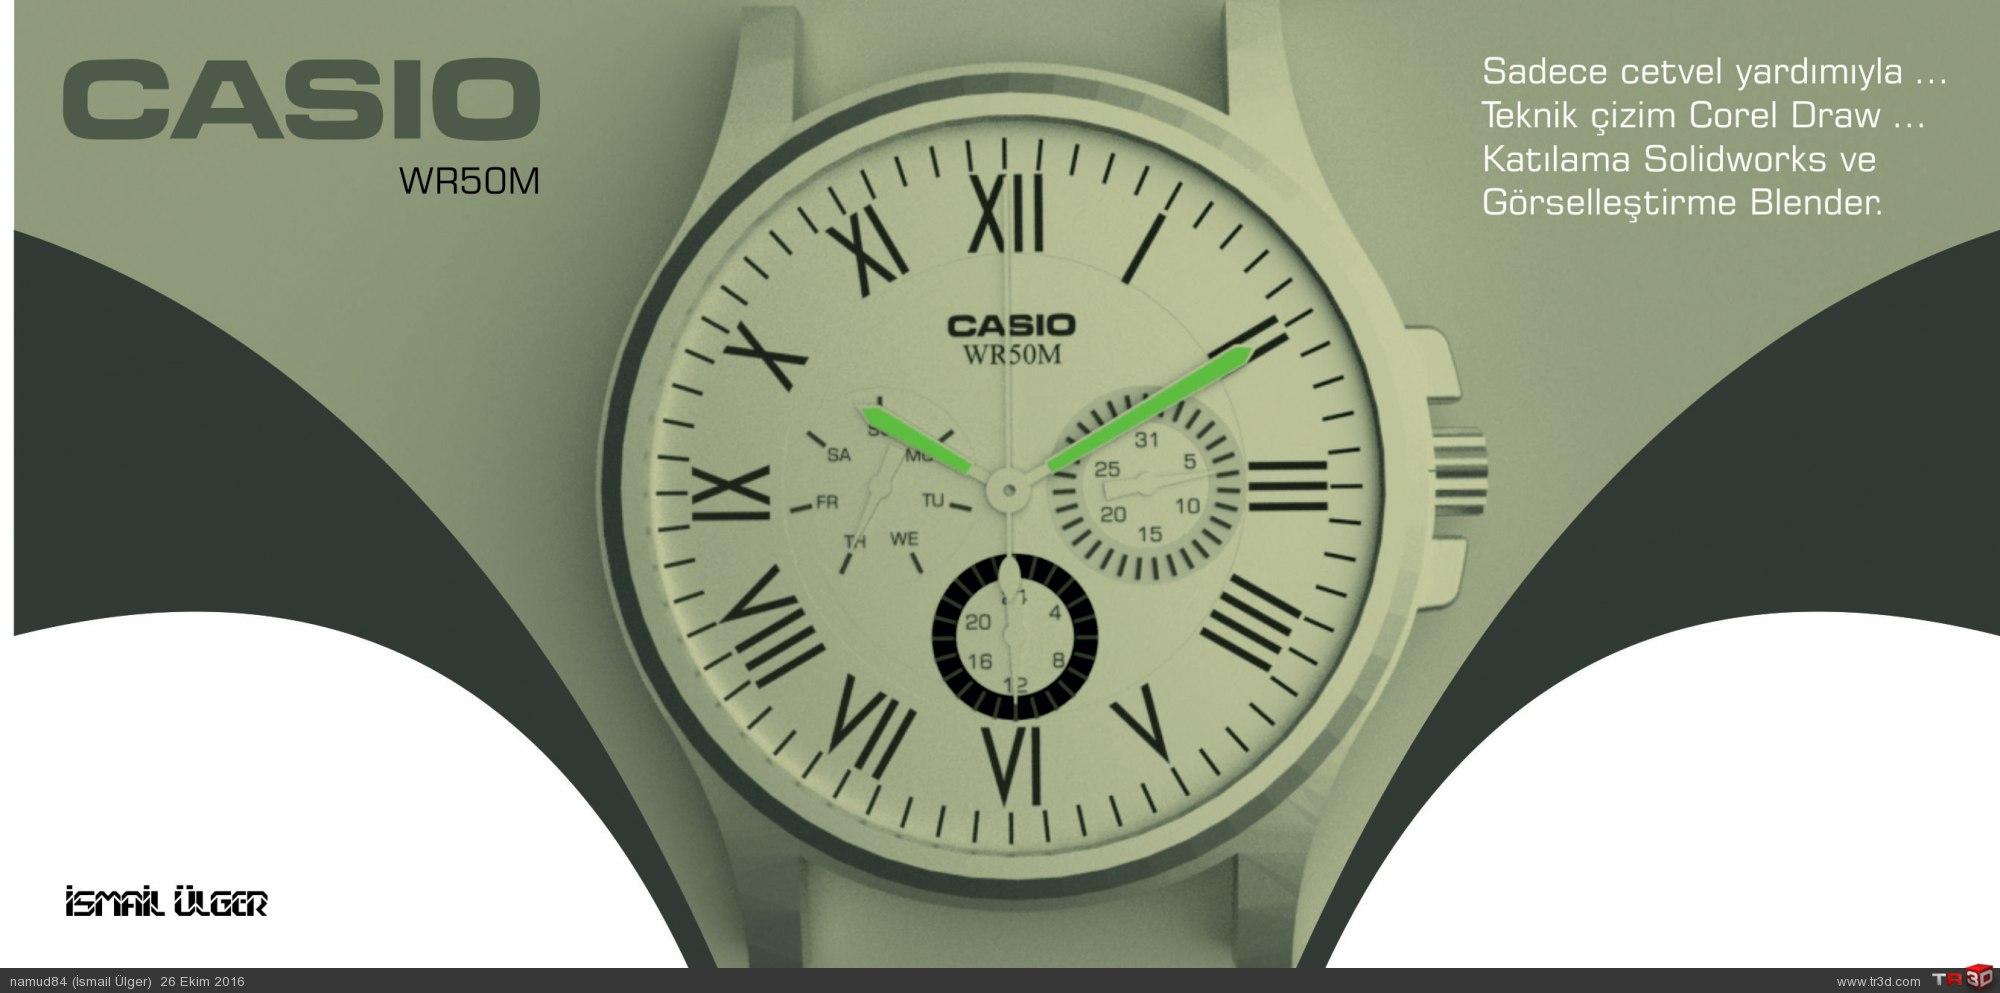 CASIO WR50M Analog saat